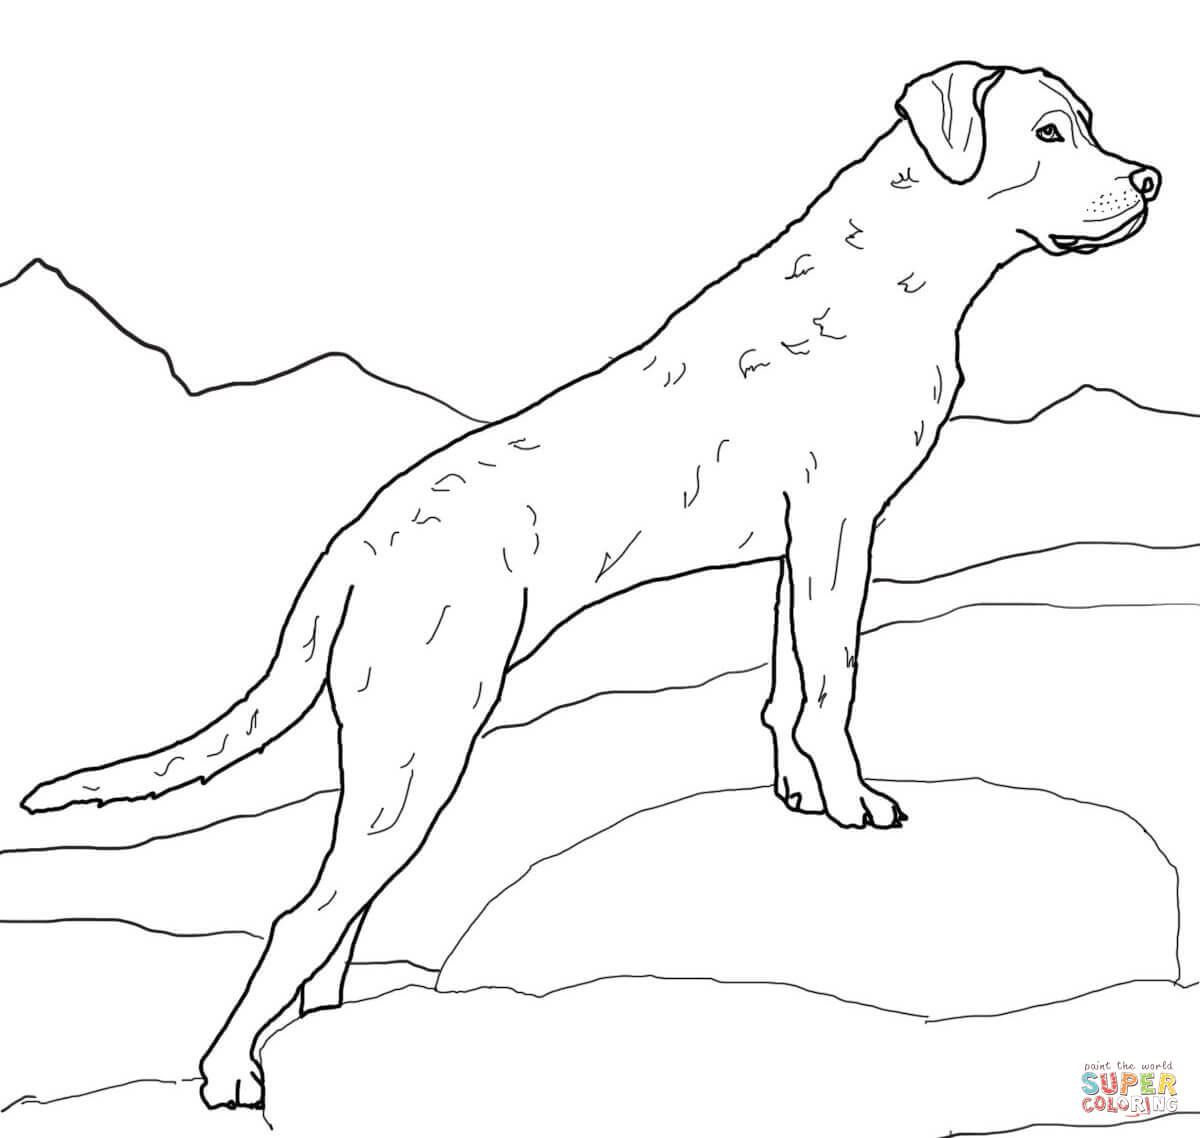 Labrador Retriever Coloring Page Free Printable Coloring Pages Dessin